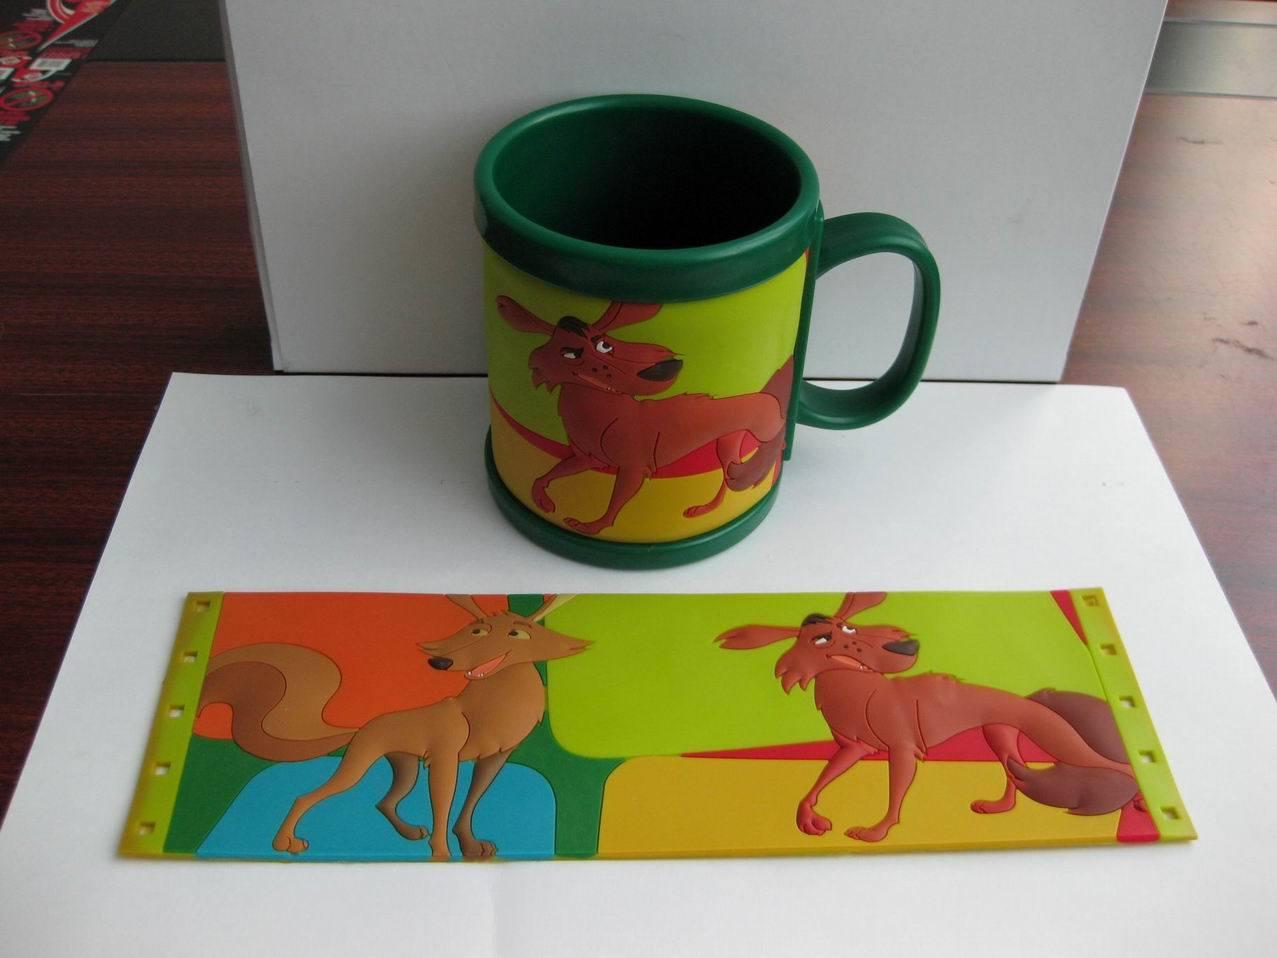 China animal shaped mug cp 08 001 china animal shaped for Animal shaped mugs